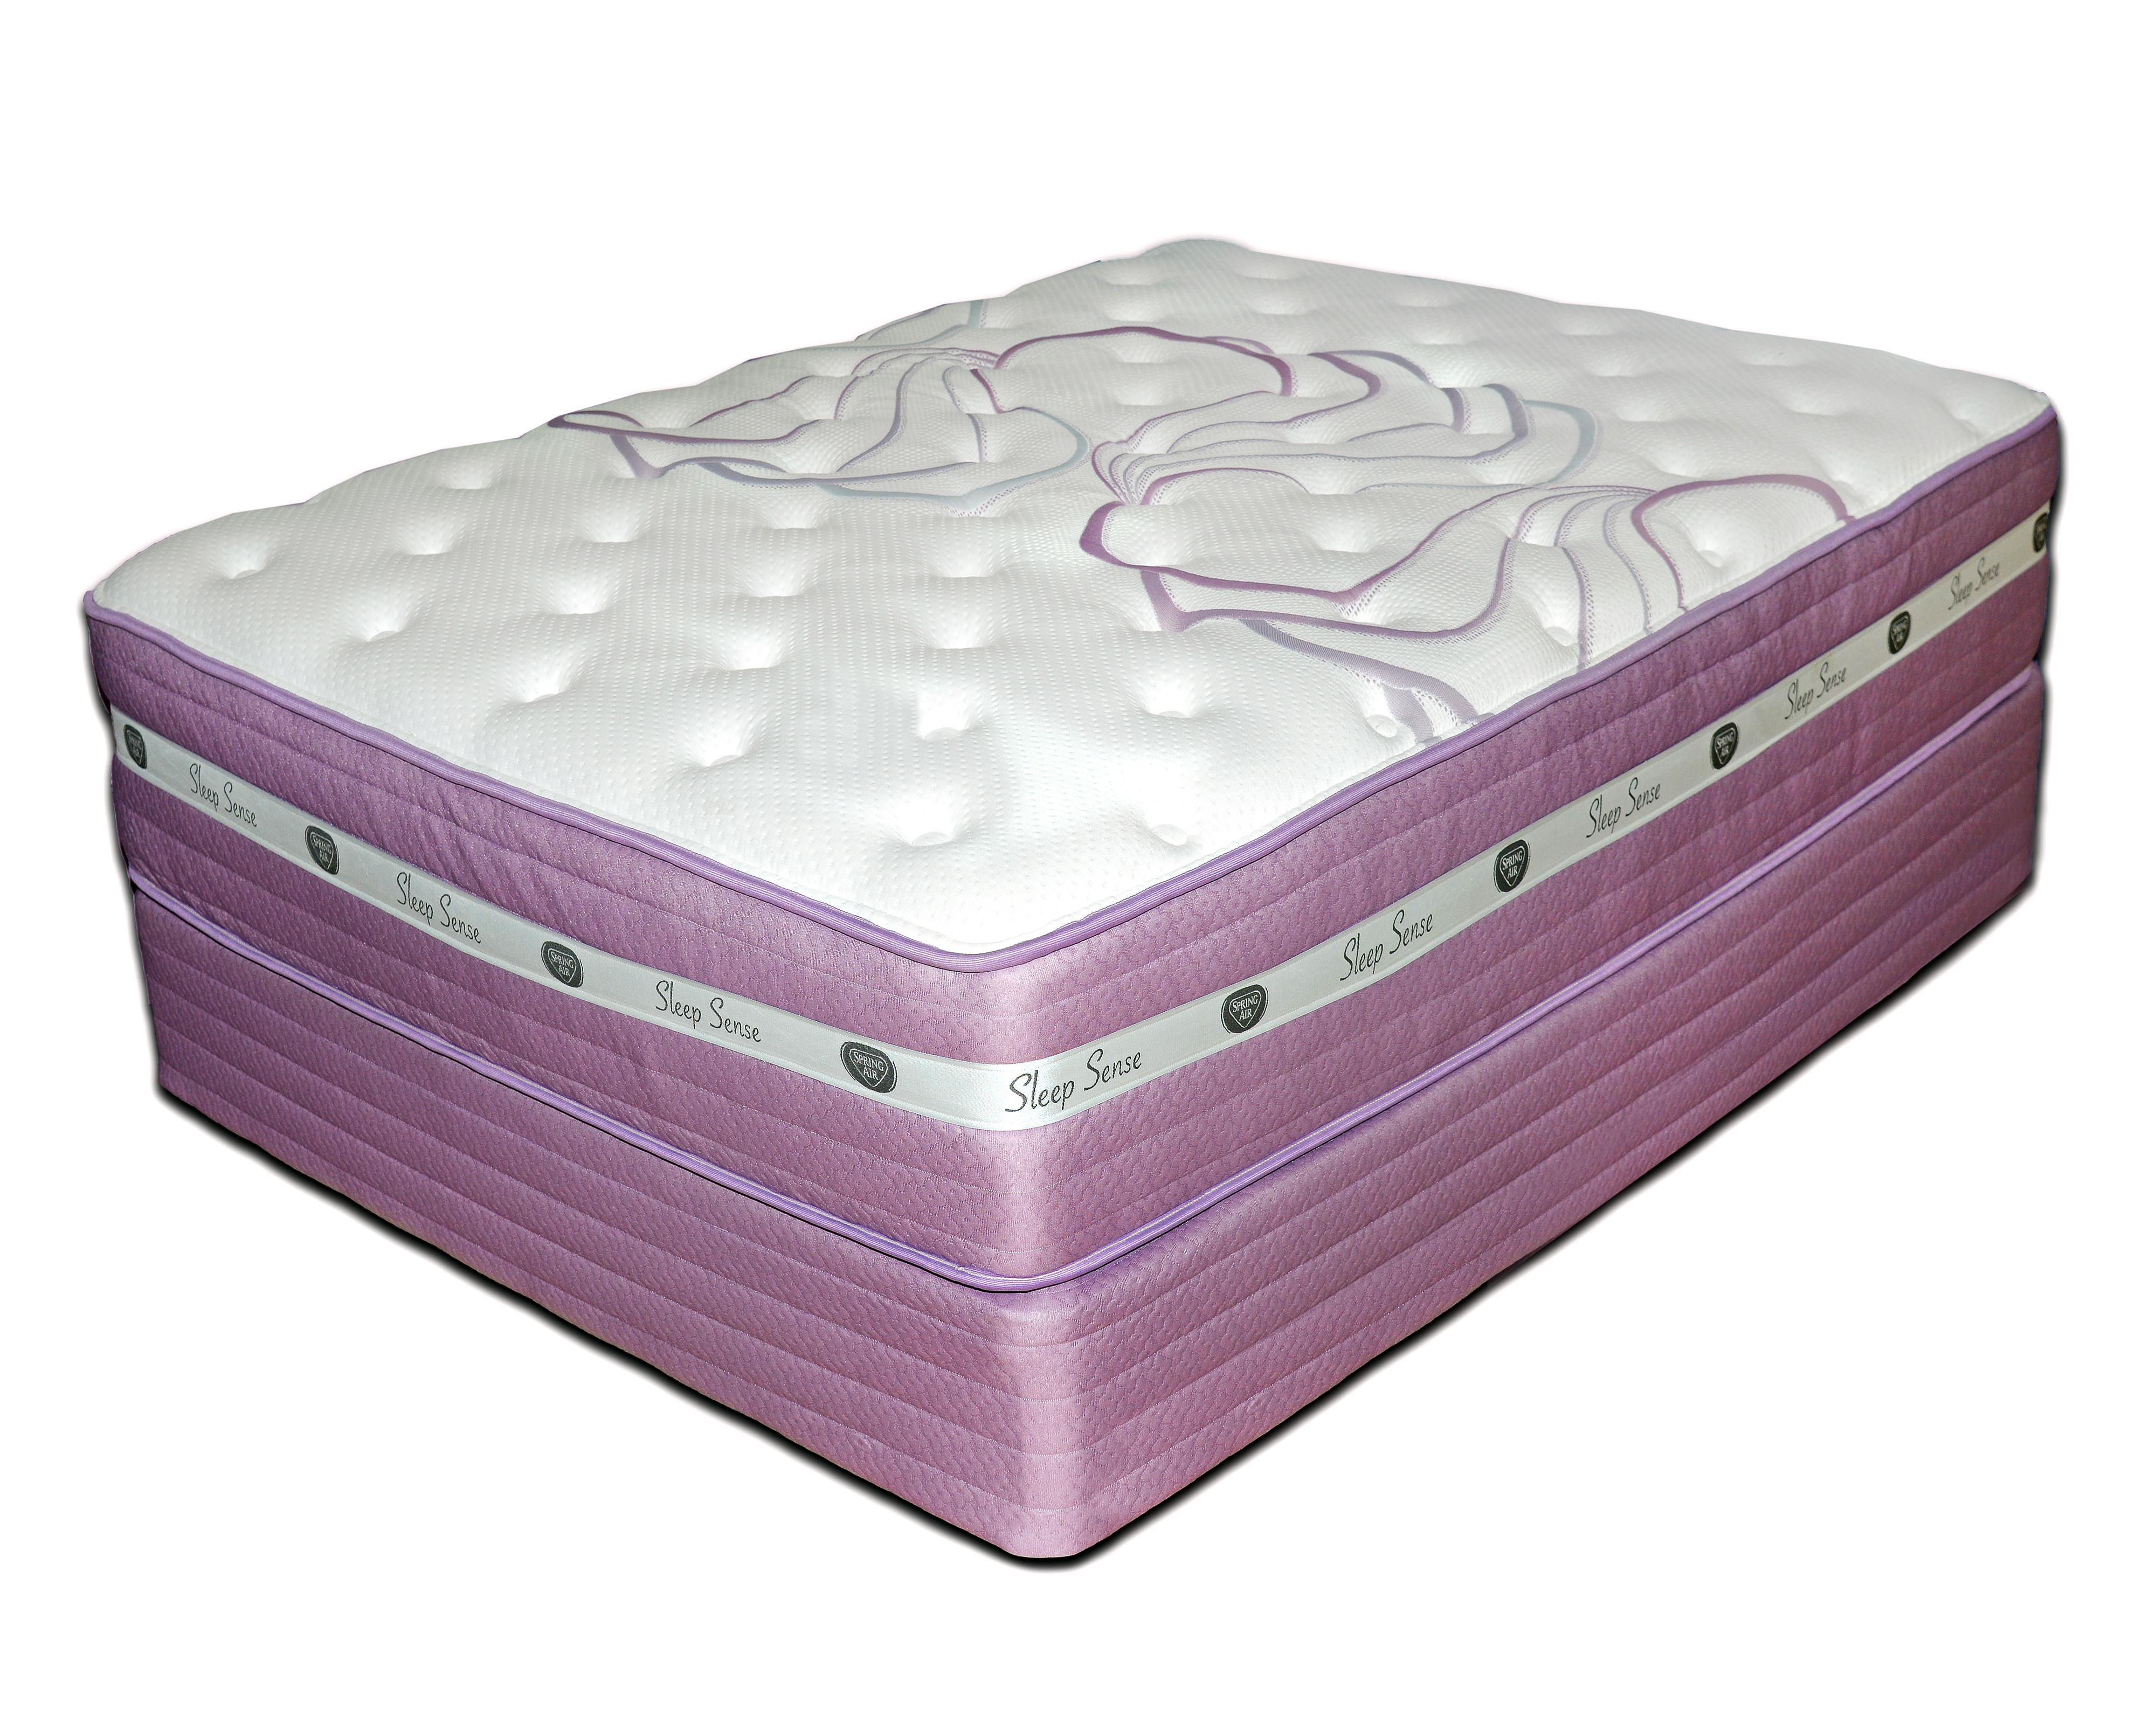 "Sleep Sense Purple Queen 13"" Firm HyBrid Mattress Set by Spring Air at Mueller Furniture"